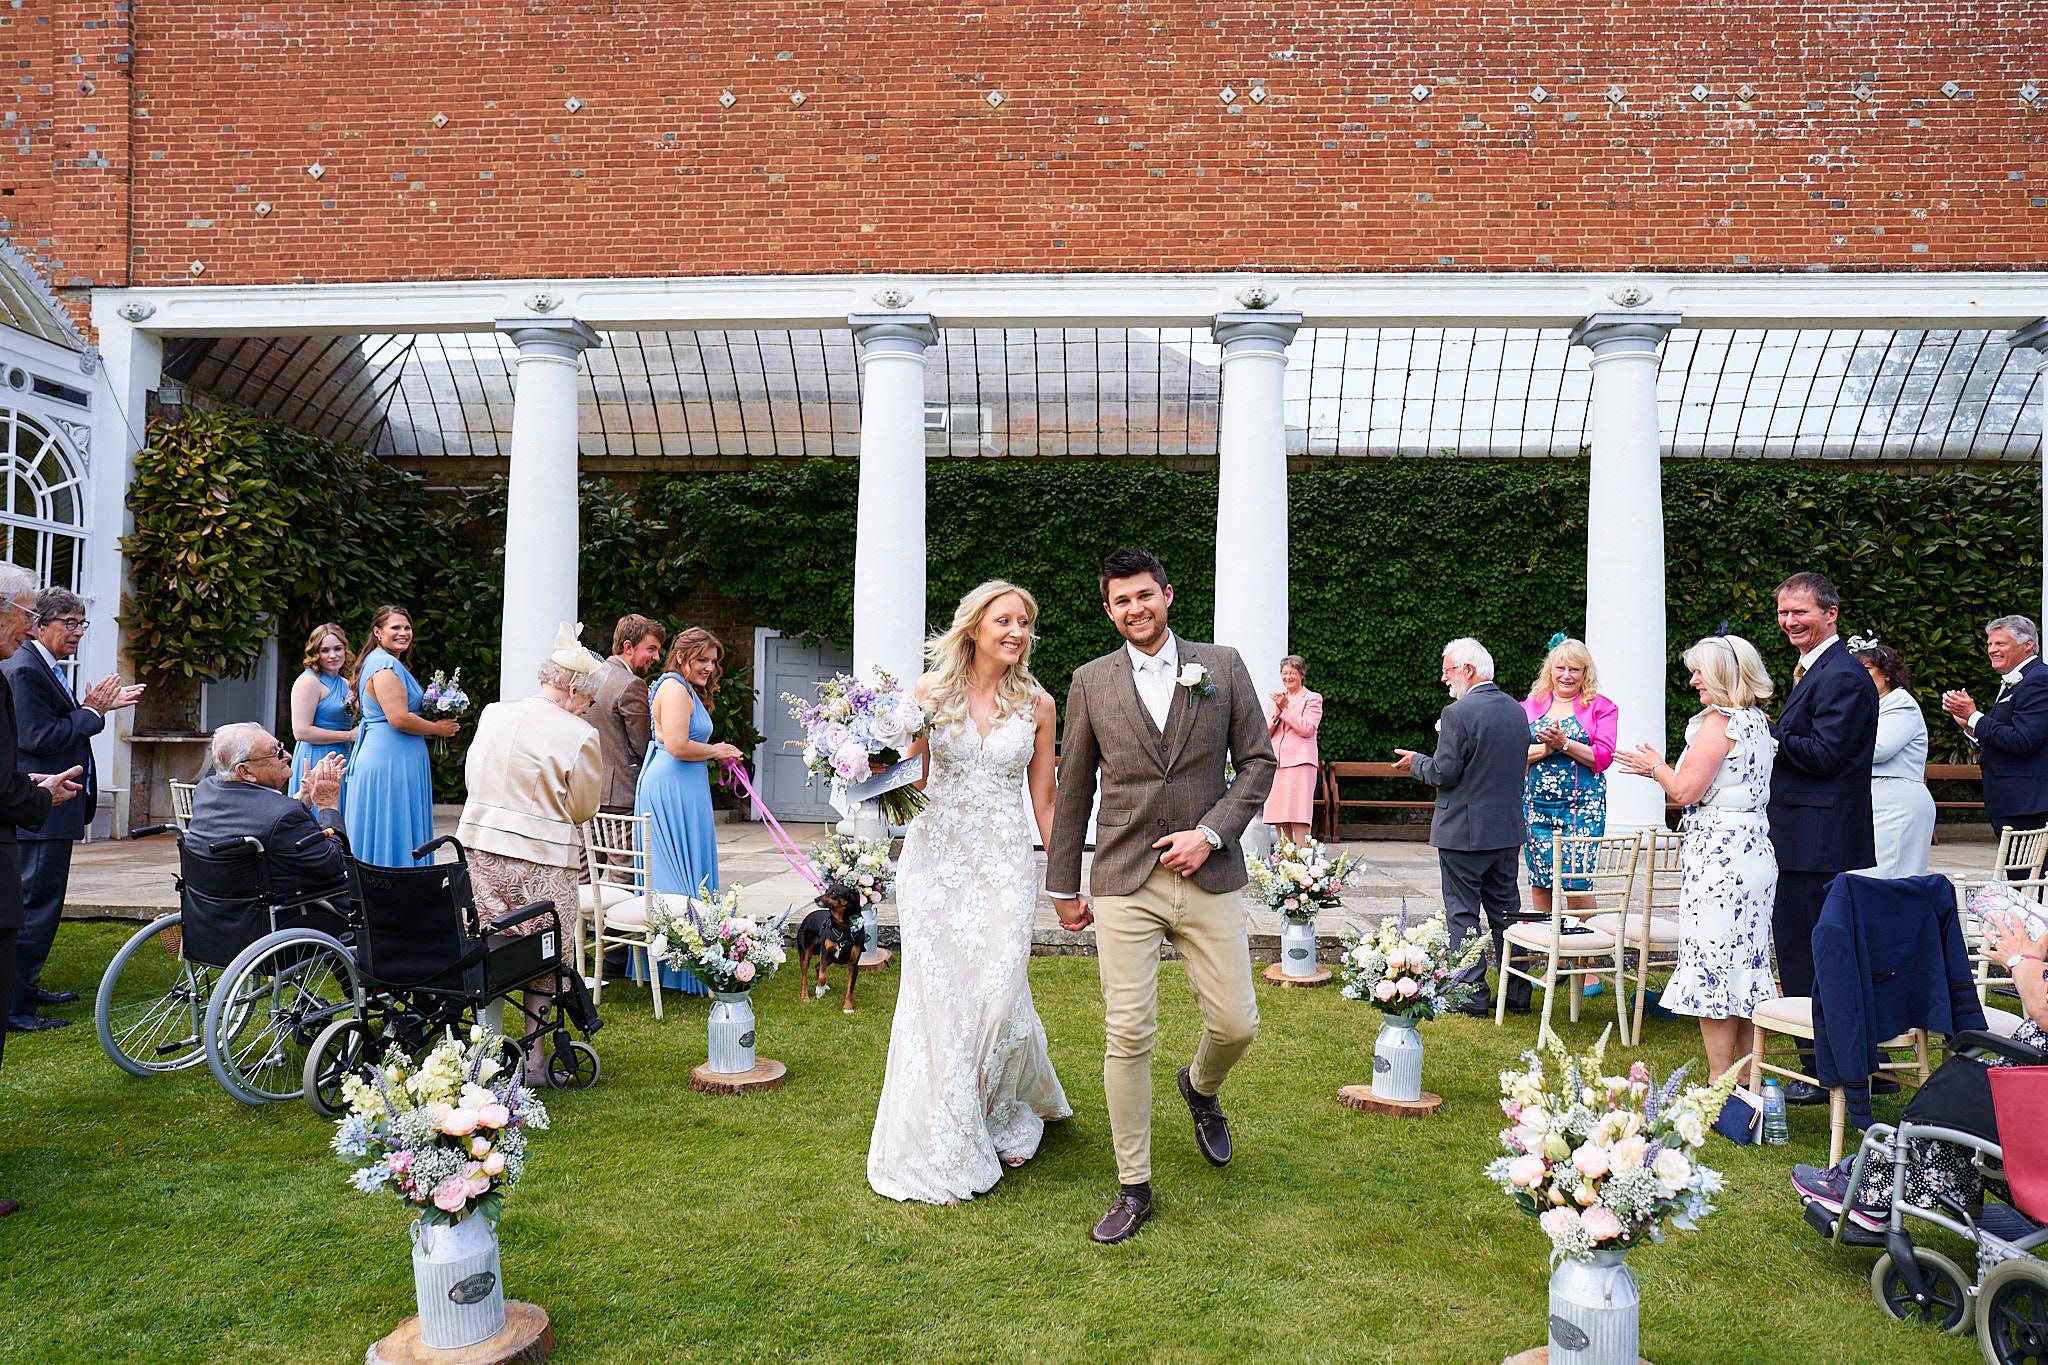 brdie and groom walking down the aisle outside avington park manor house